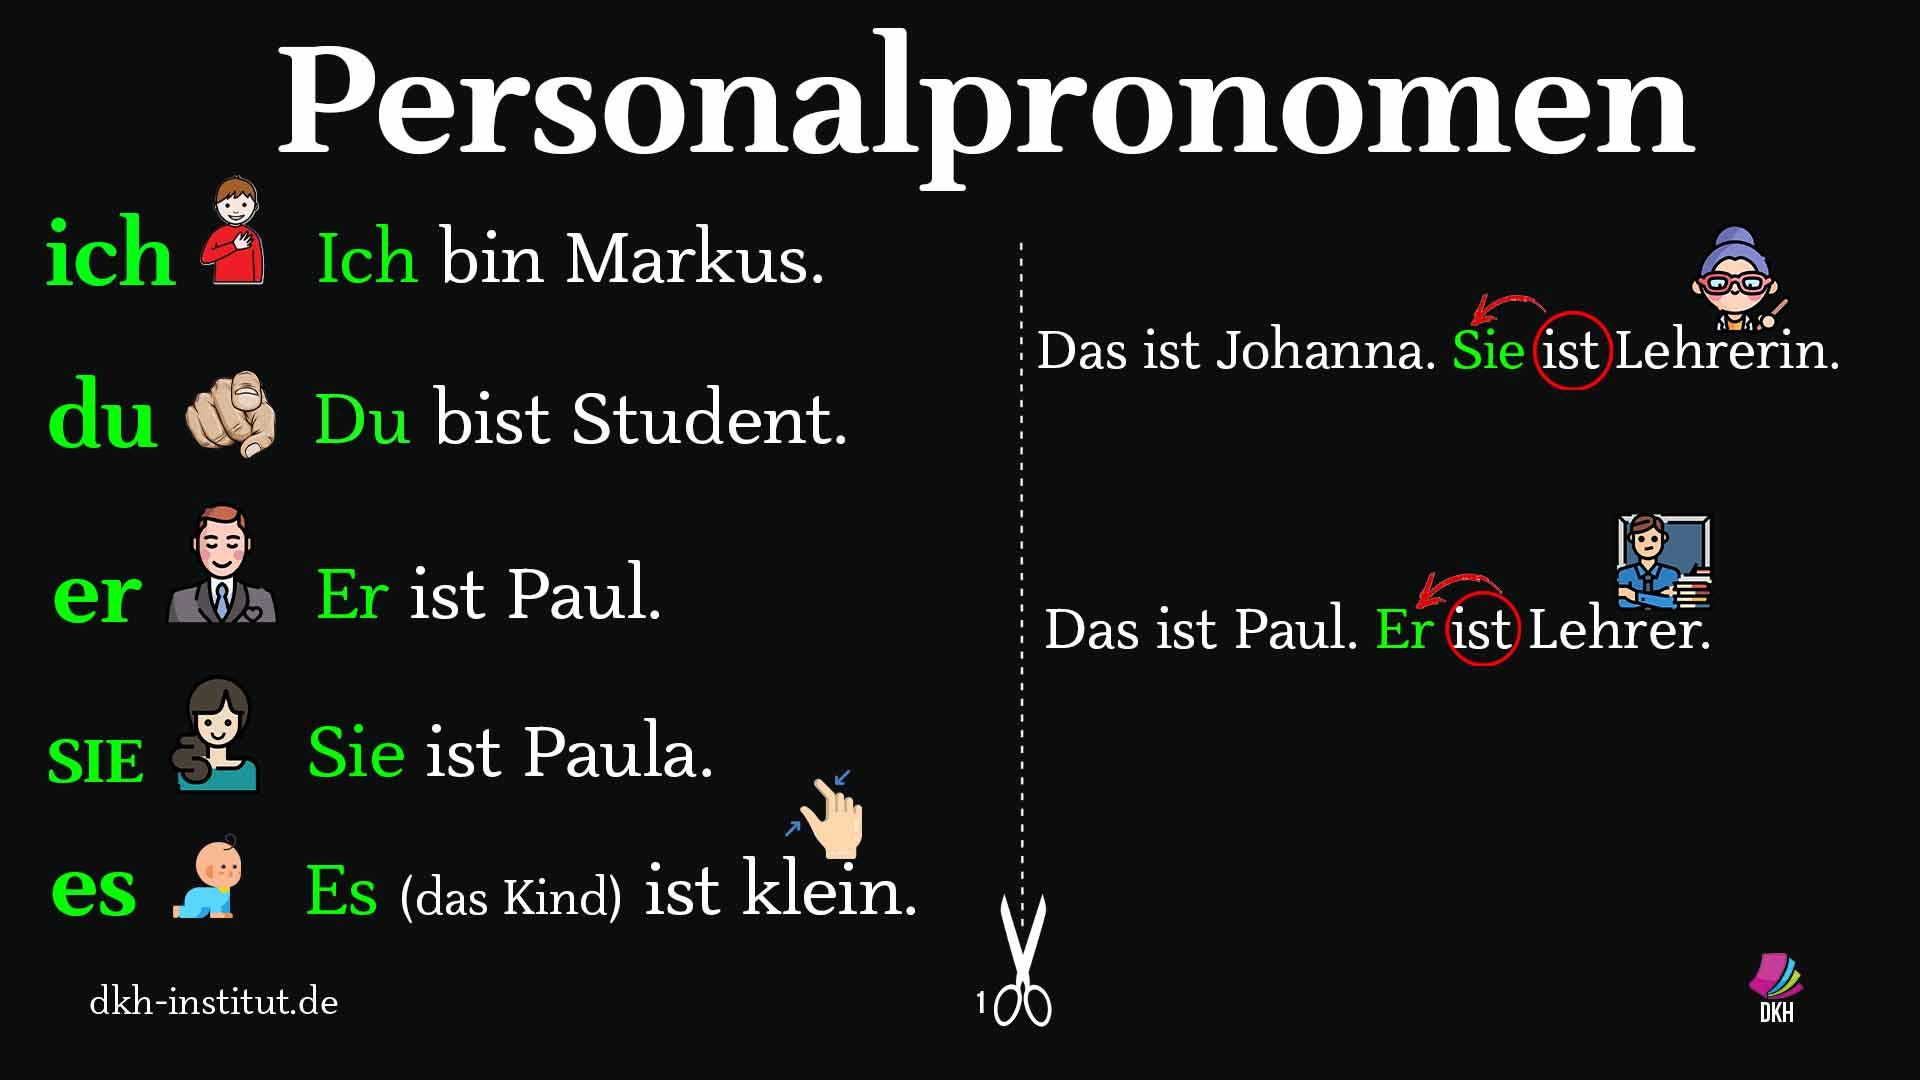 #personalpronomen